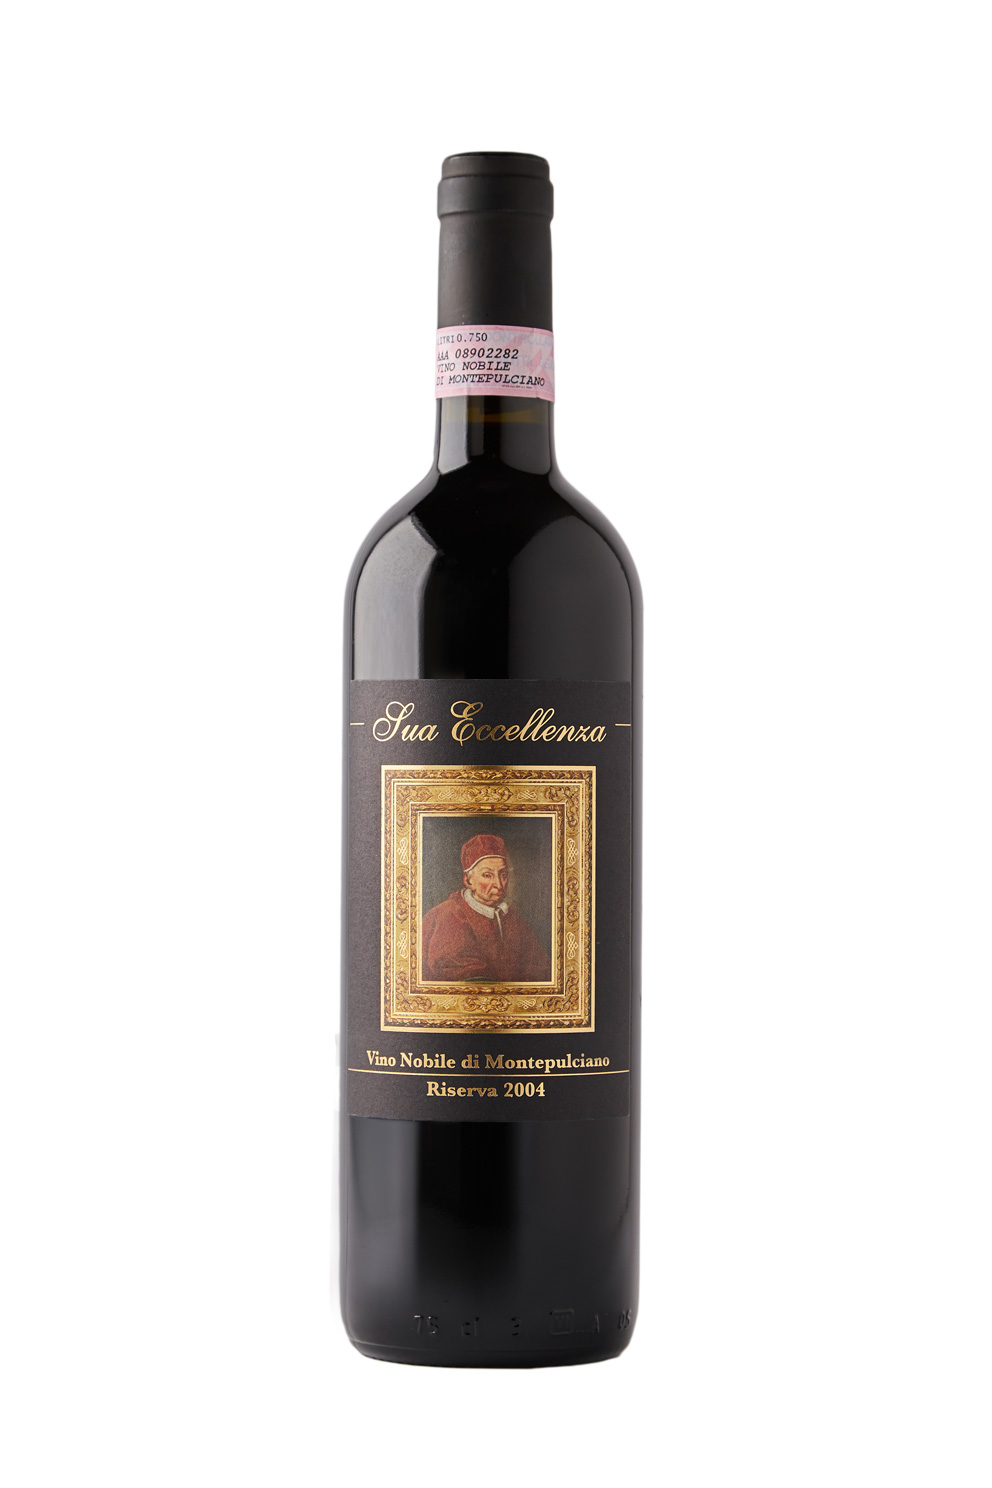 Magnum vino Nobile di Montepulciano d.o.c.g. riserva Ercolani 2012